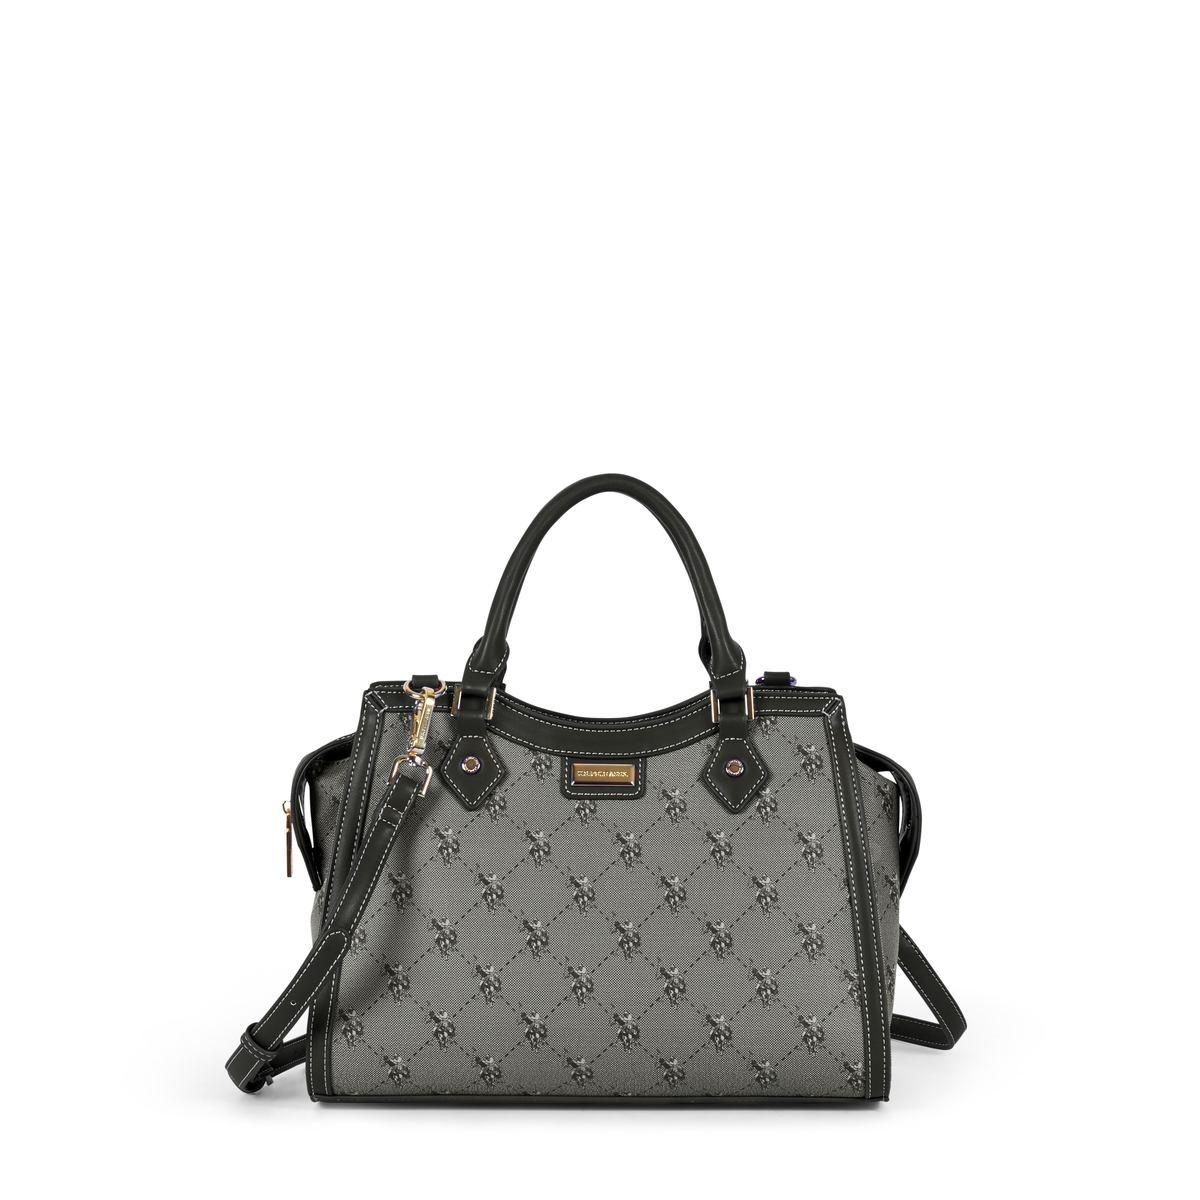 US Polo Assn. Τσάντα χειρός γυναικεία 33x15x23cm Hampton Black